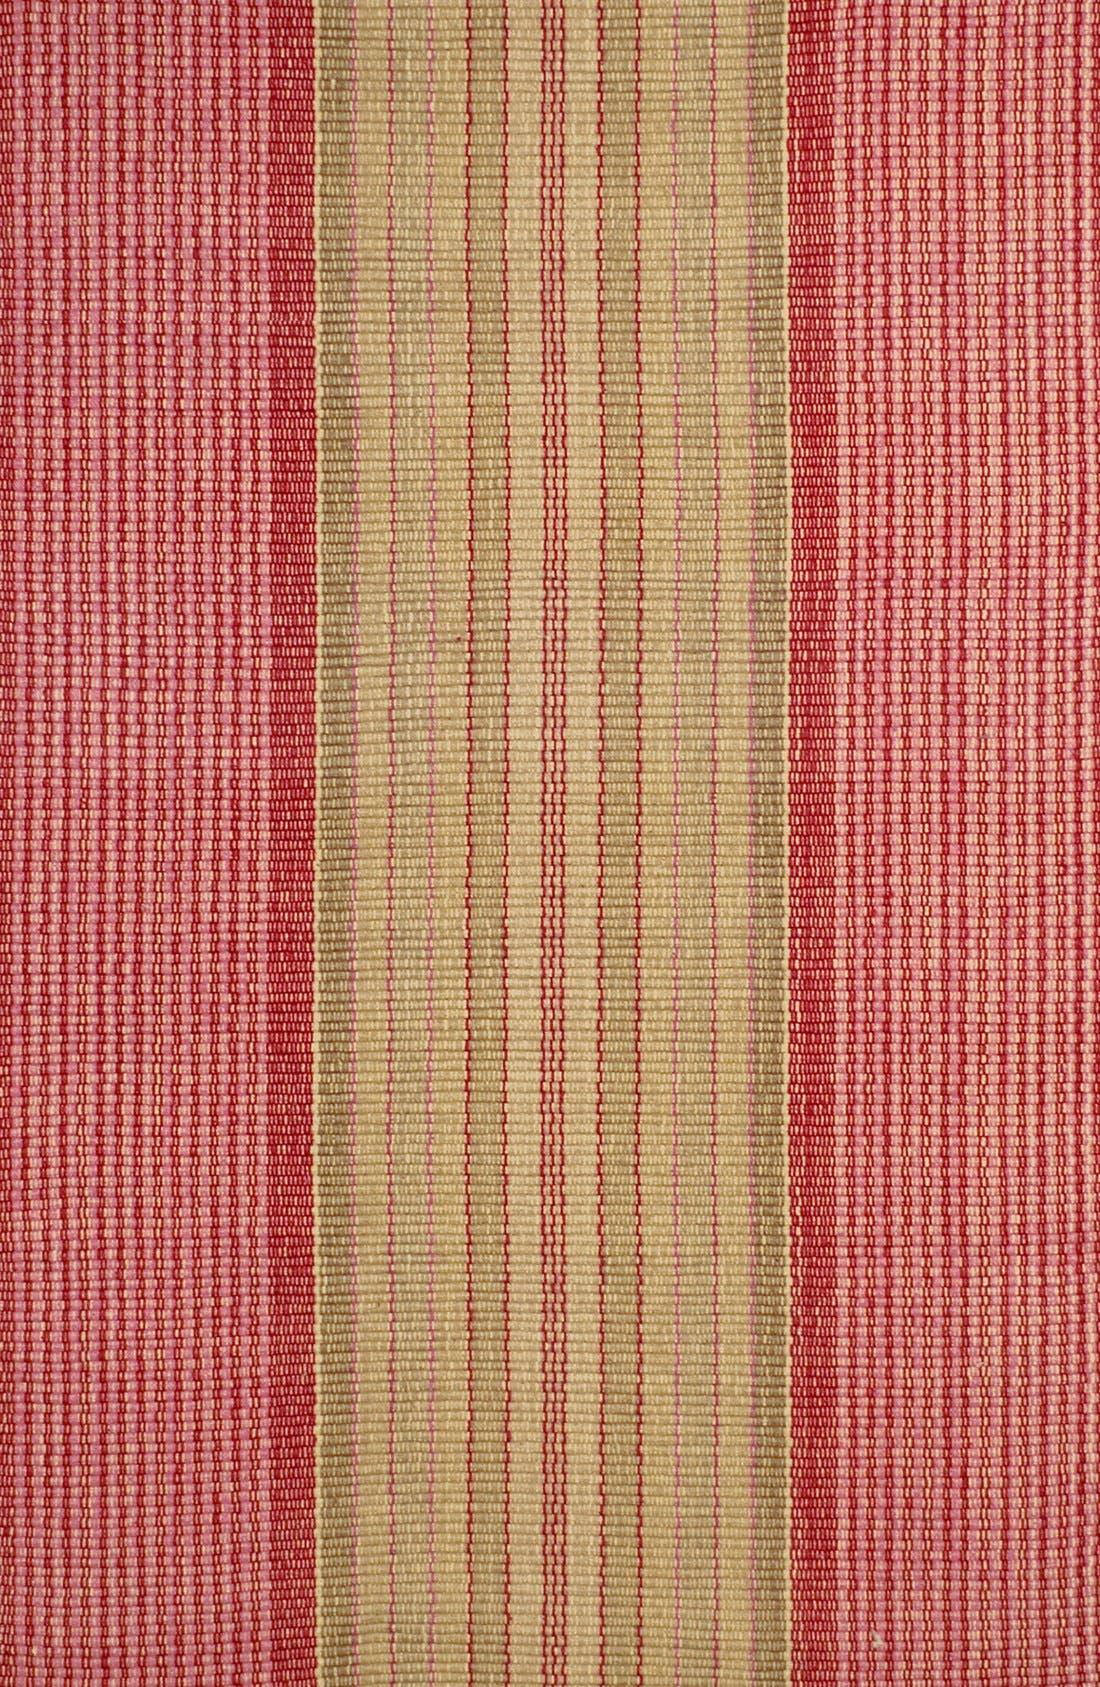 Main Image - Dash & Albert 'Framboise' Cotton Rug